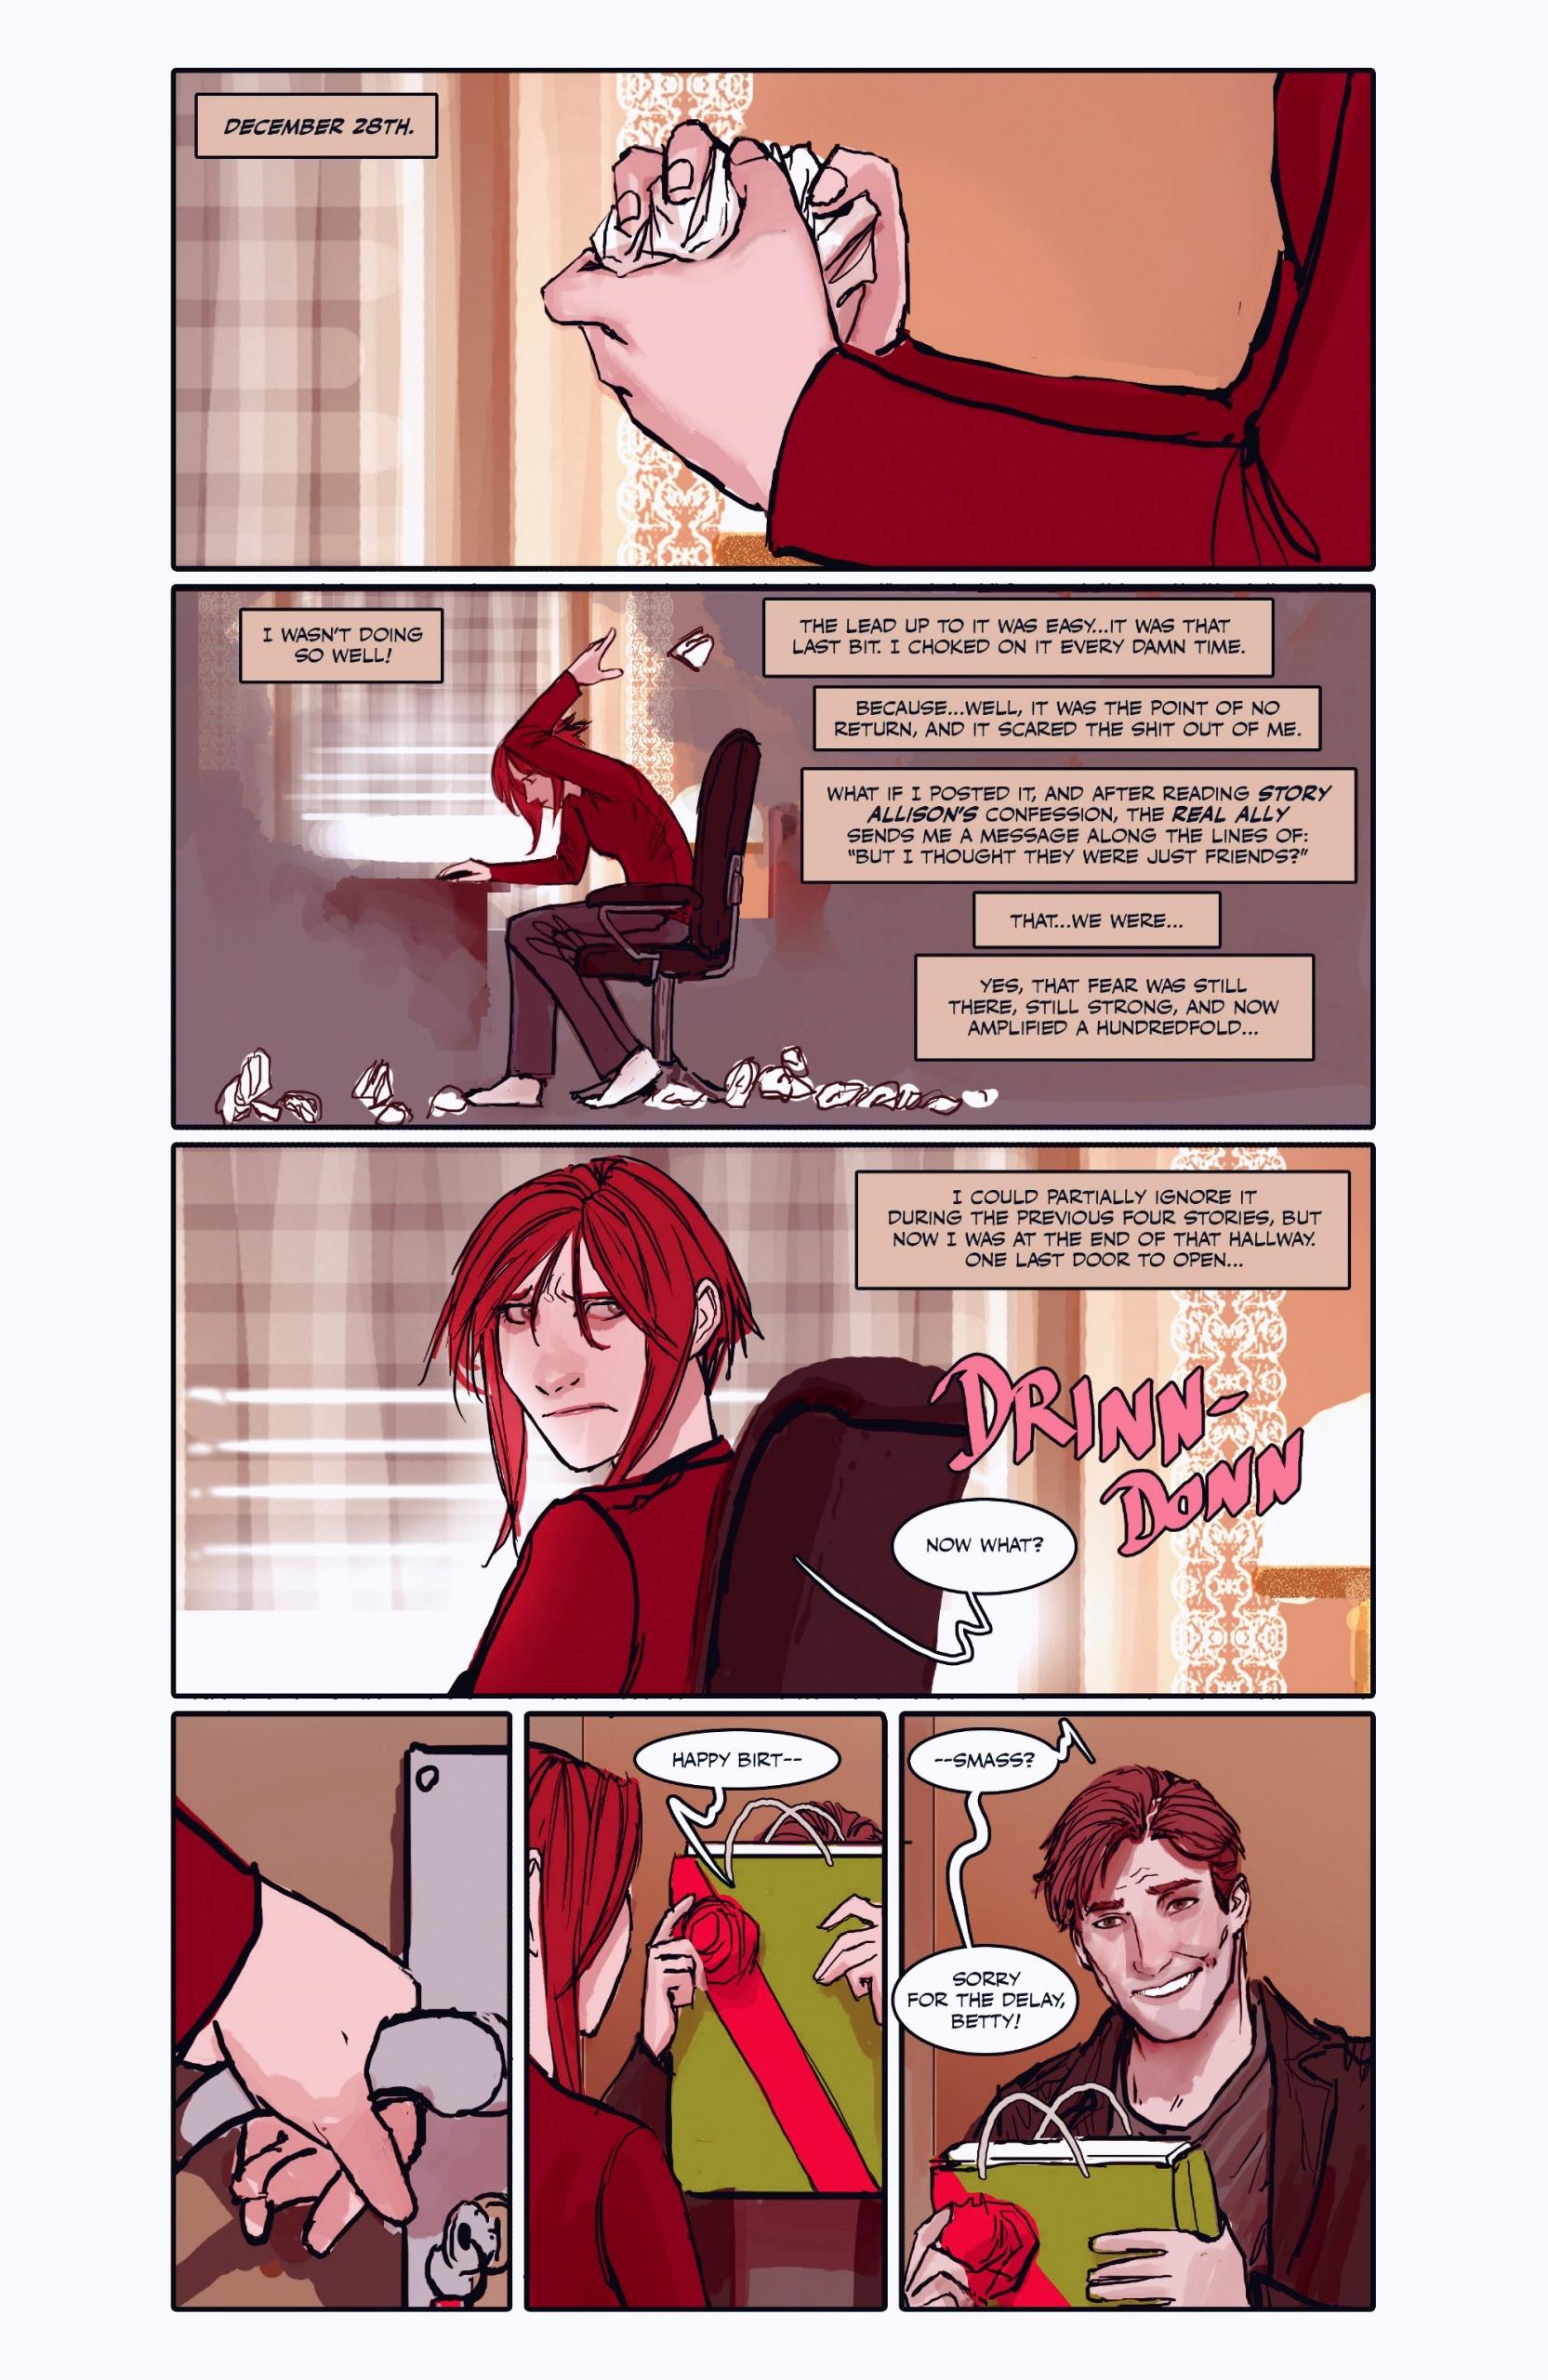 Sunstone - Volume 5 page 175